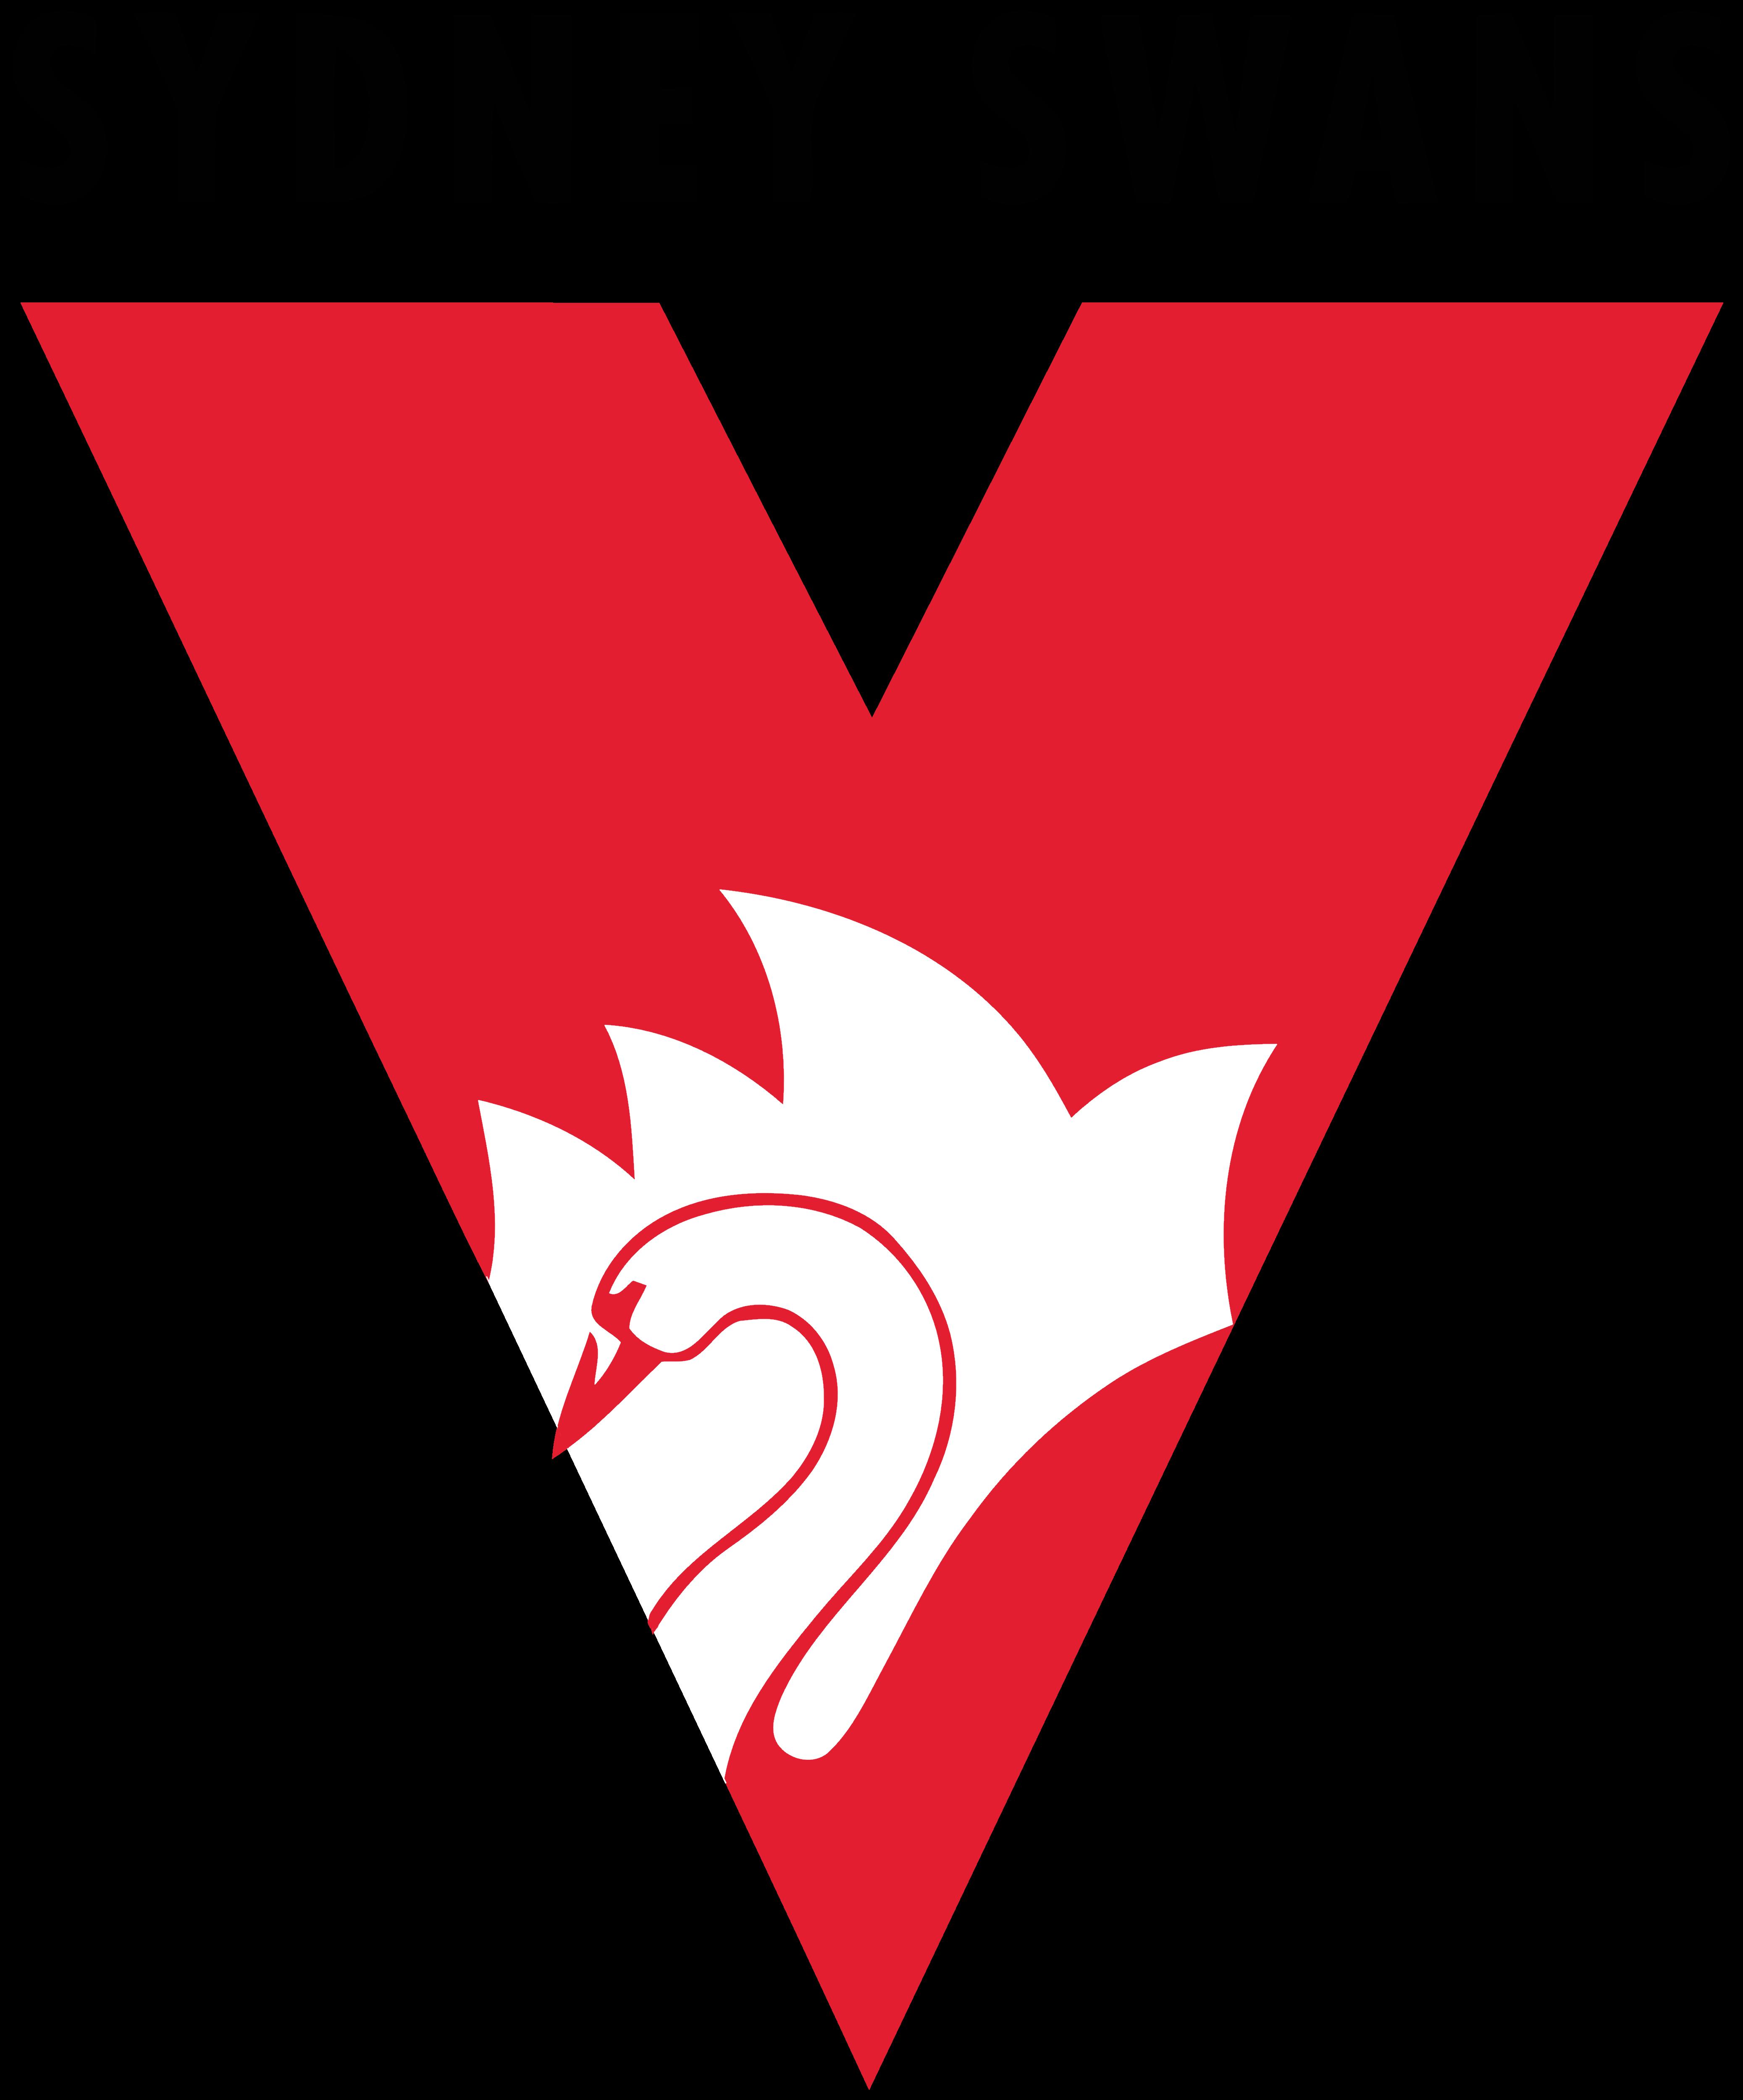 Sydney Swans Fc Logos Download